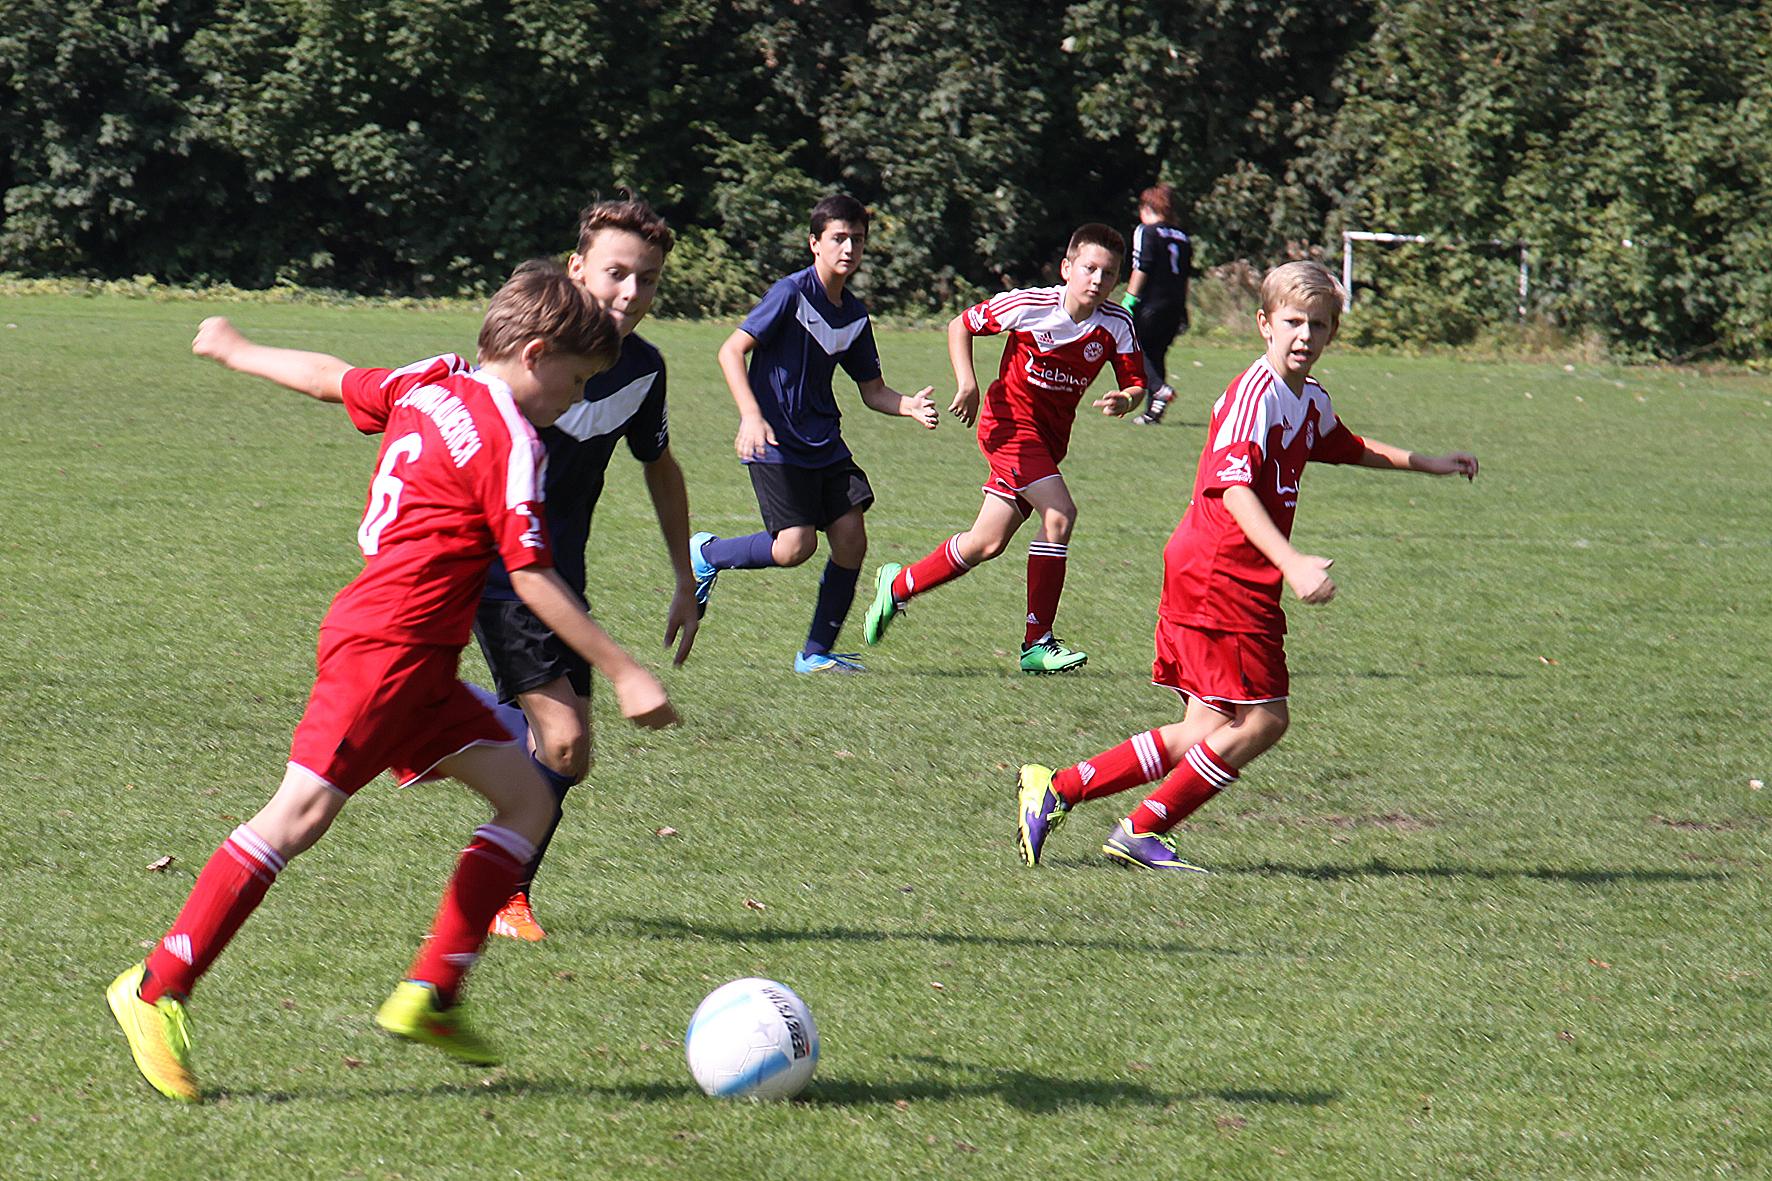 Spielszene JSG Unna/Billmerich gegen Königsborner SV D1-Junioren